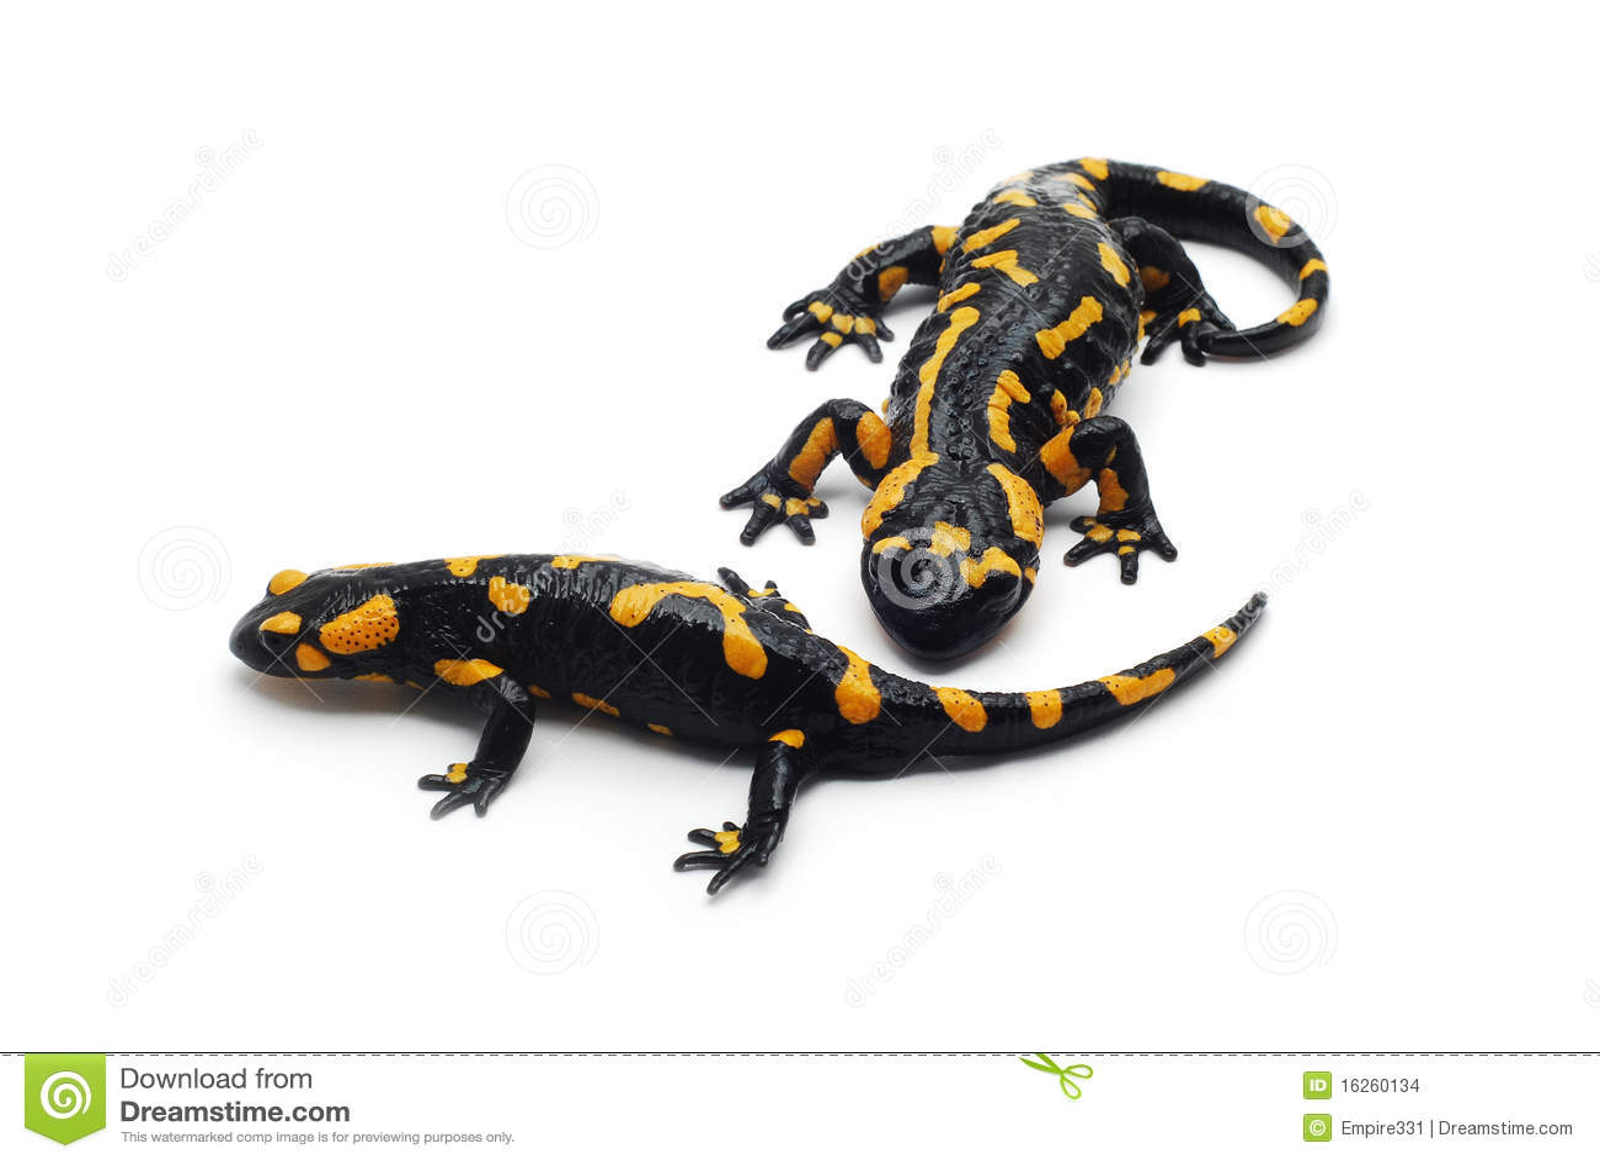 salamander white background - photo #9